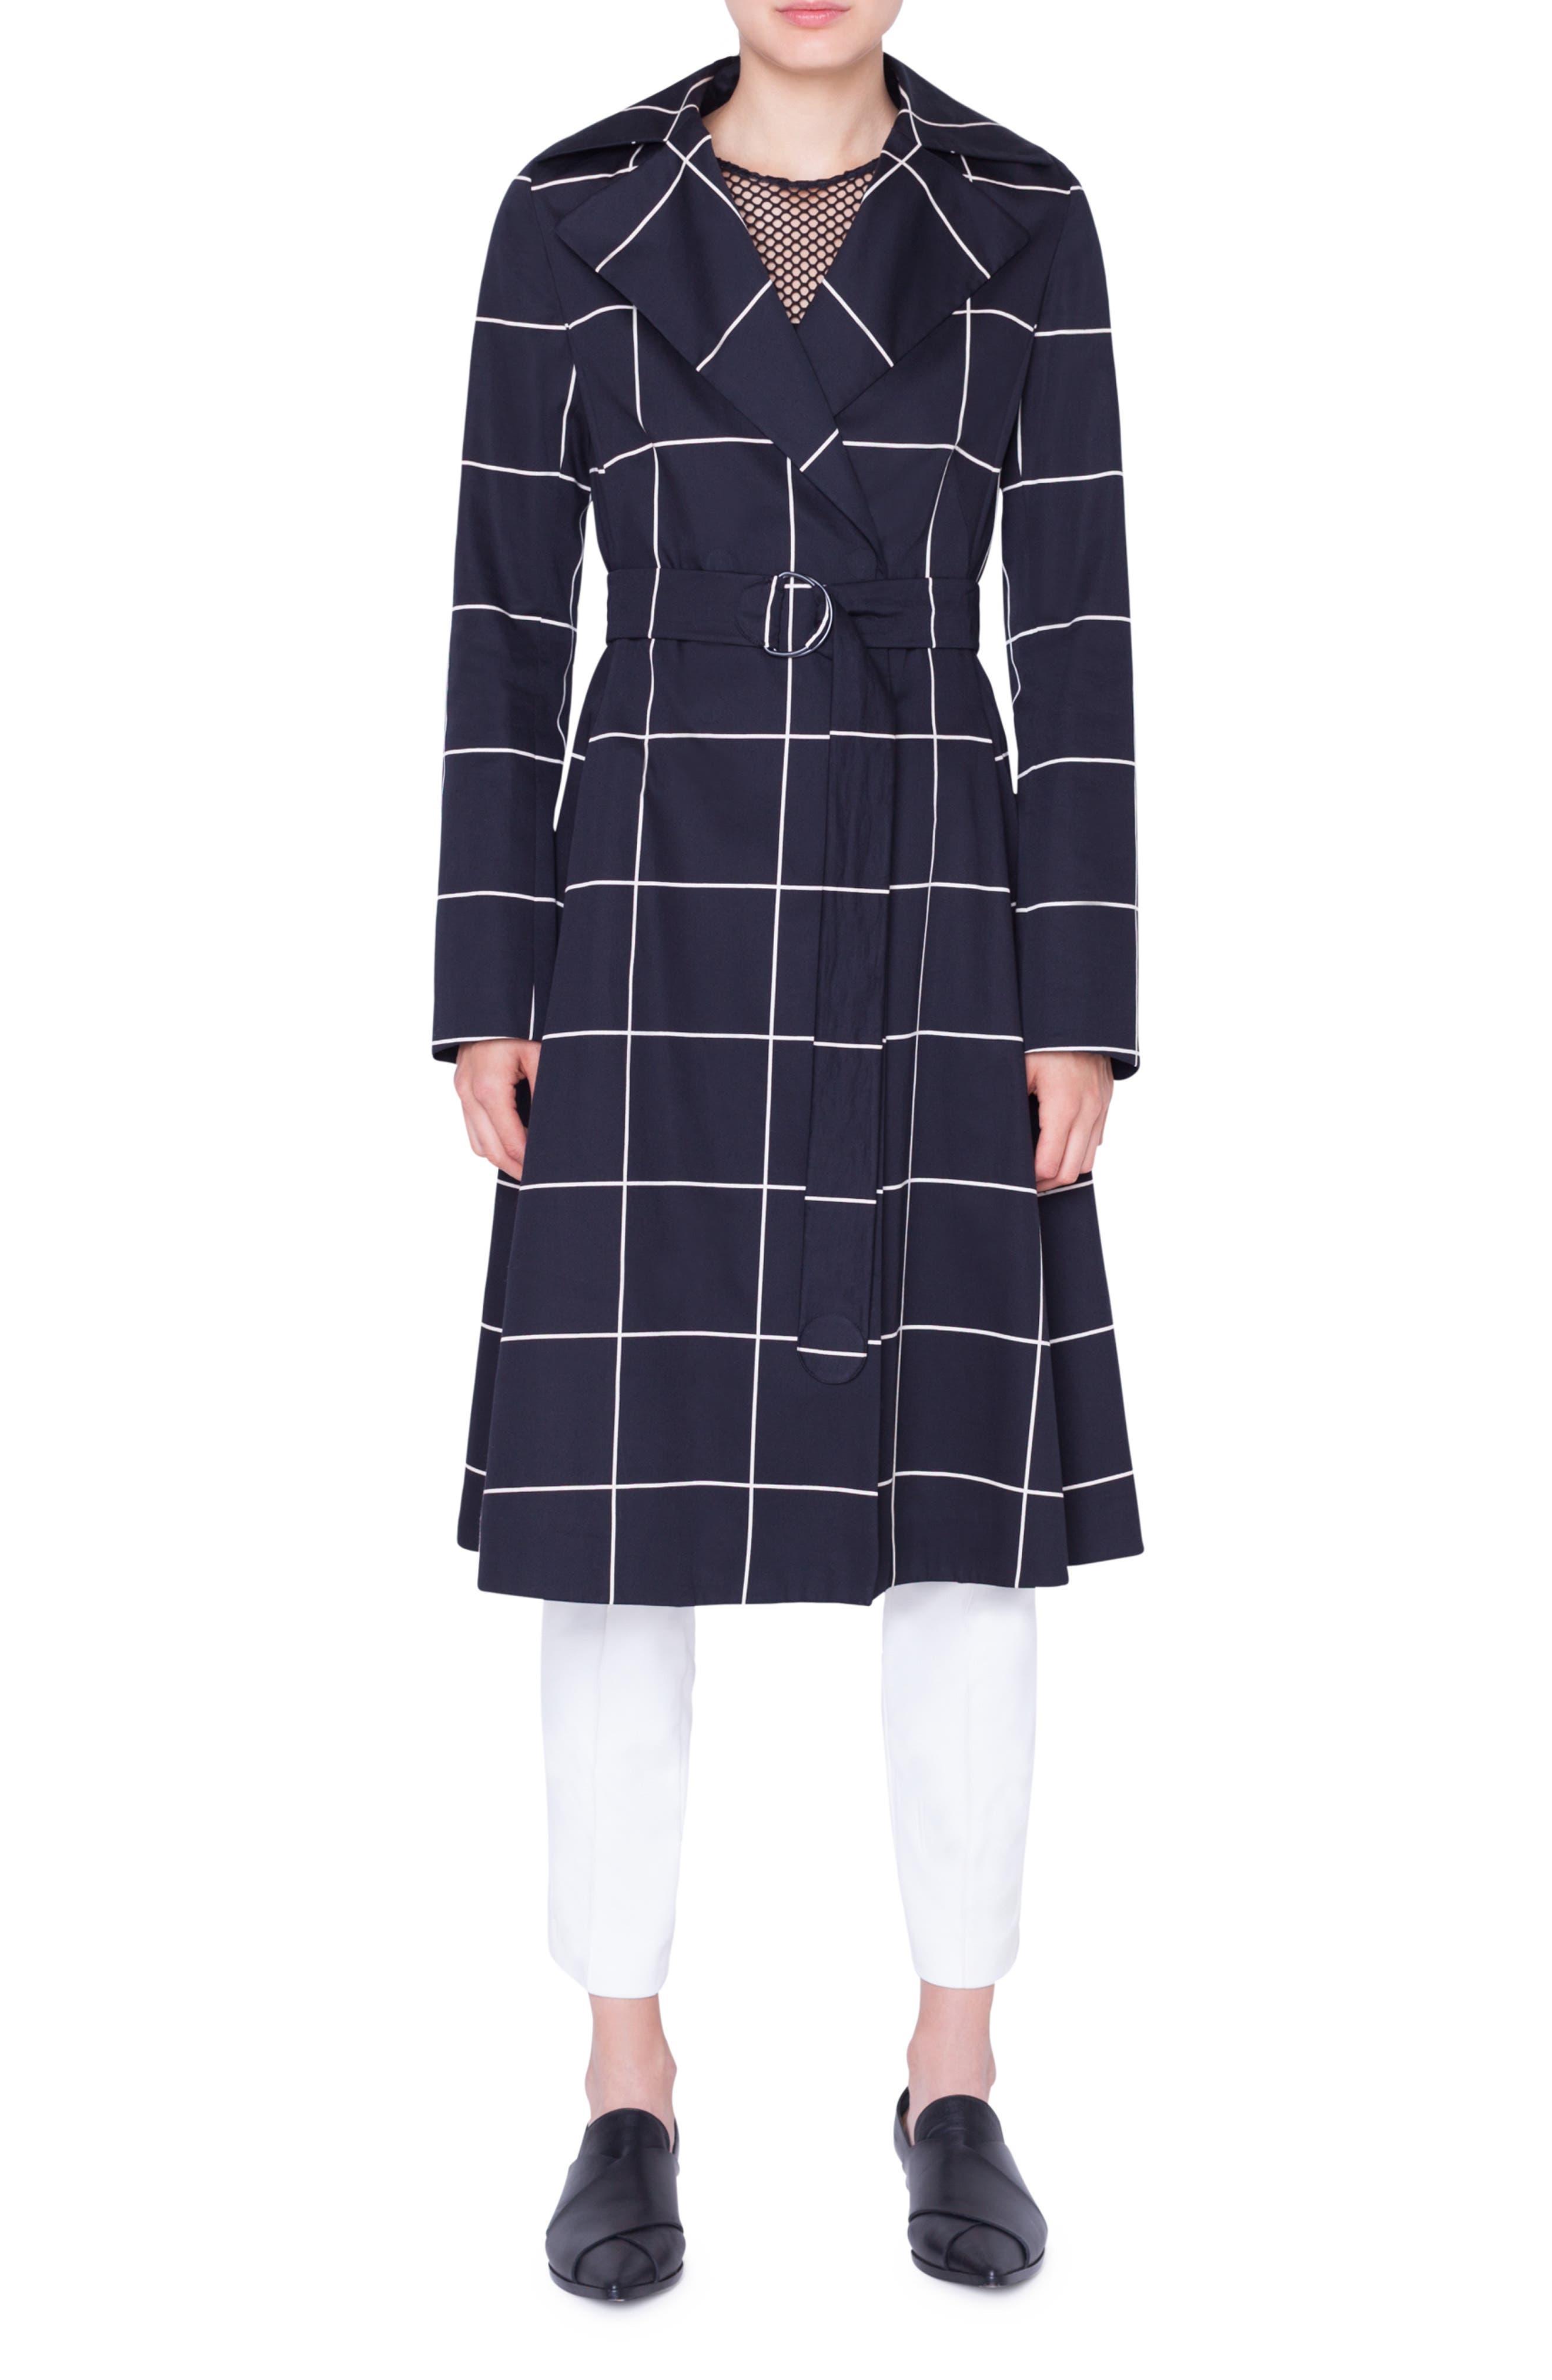 AKRIS PUNTO,                             Grid Jacquard Trench Coat,                             Main thumbnail 1, color,                             NERO-CREMA